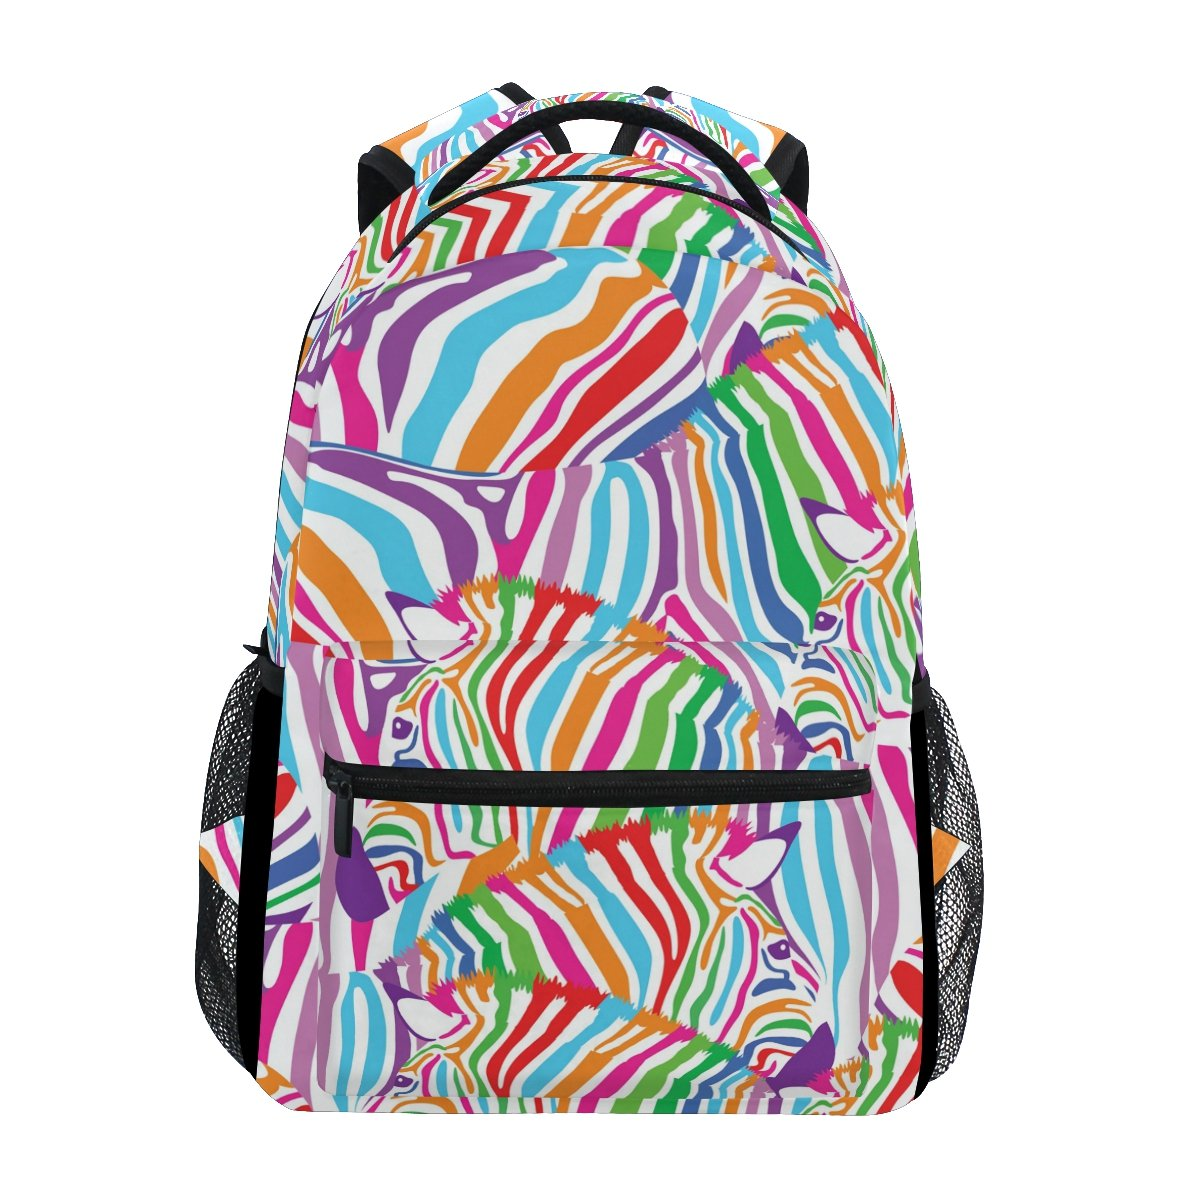 ISAOA g6688618p203c237s337 - Mochila de Color Senderismo Unisex Adulto, L, Color de 09fcbb